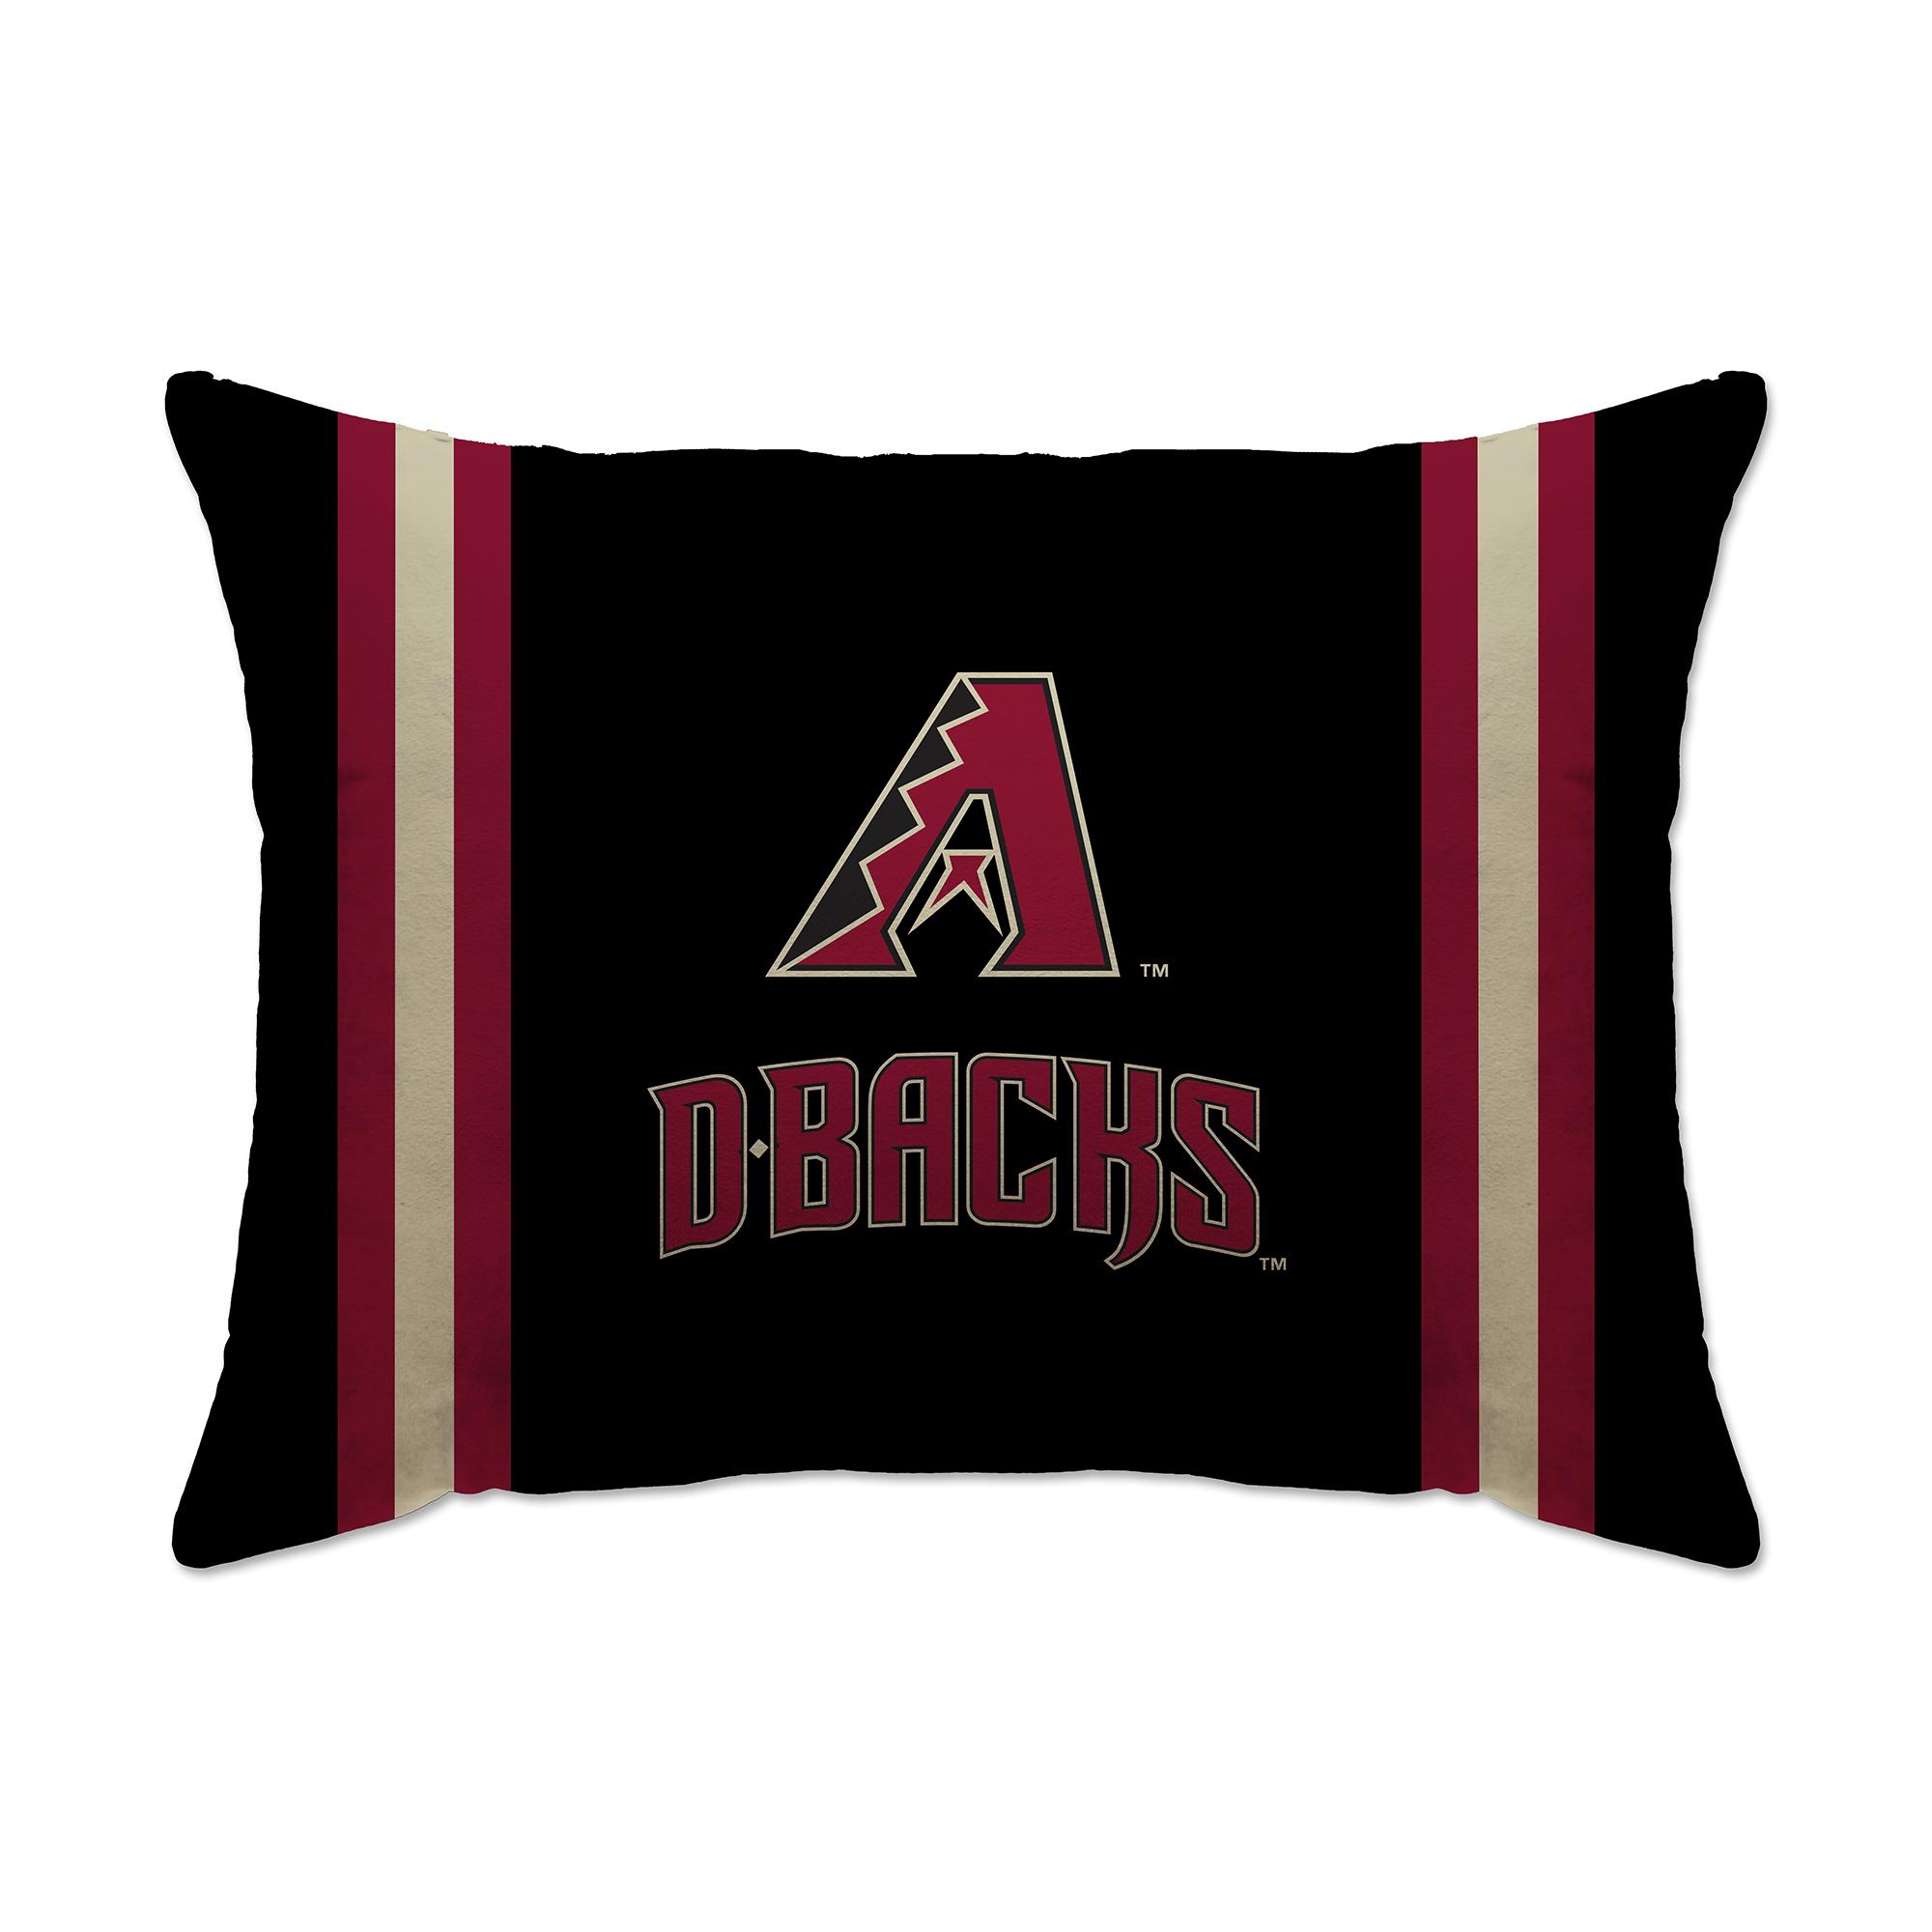 "Arizona Diamondbacks 20"" x 26"" Plush Bed Pillow - Black - No Size"